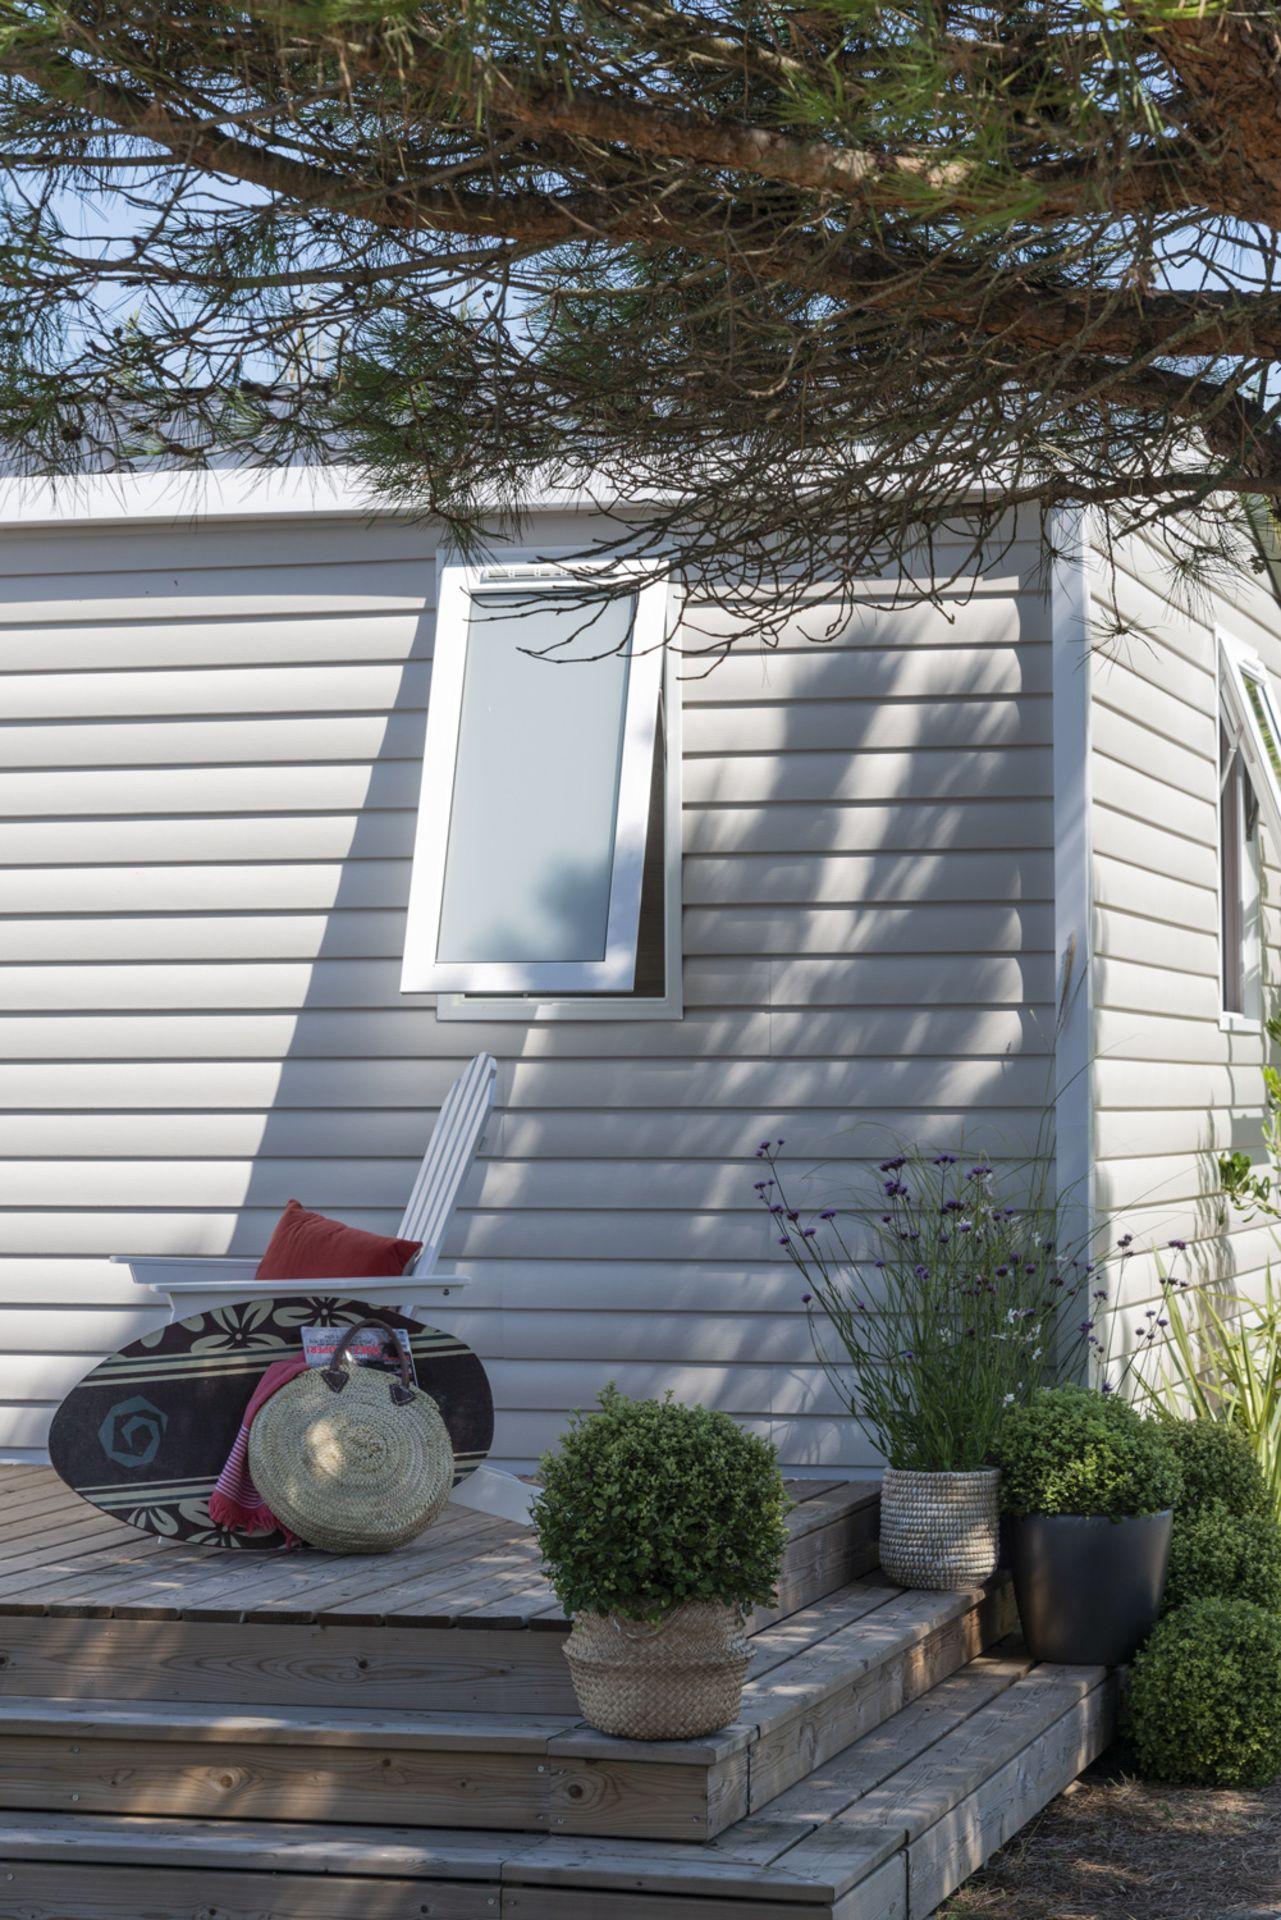 Irm Petit Paradis - 2021 - Neuf - RESIDENTIEL - Zen Mobil home